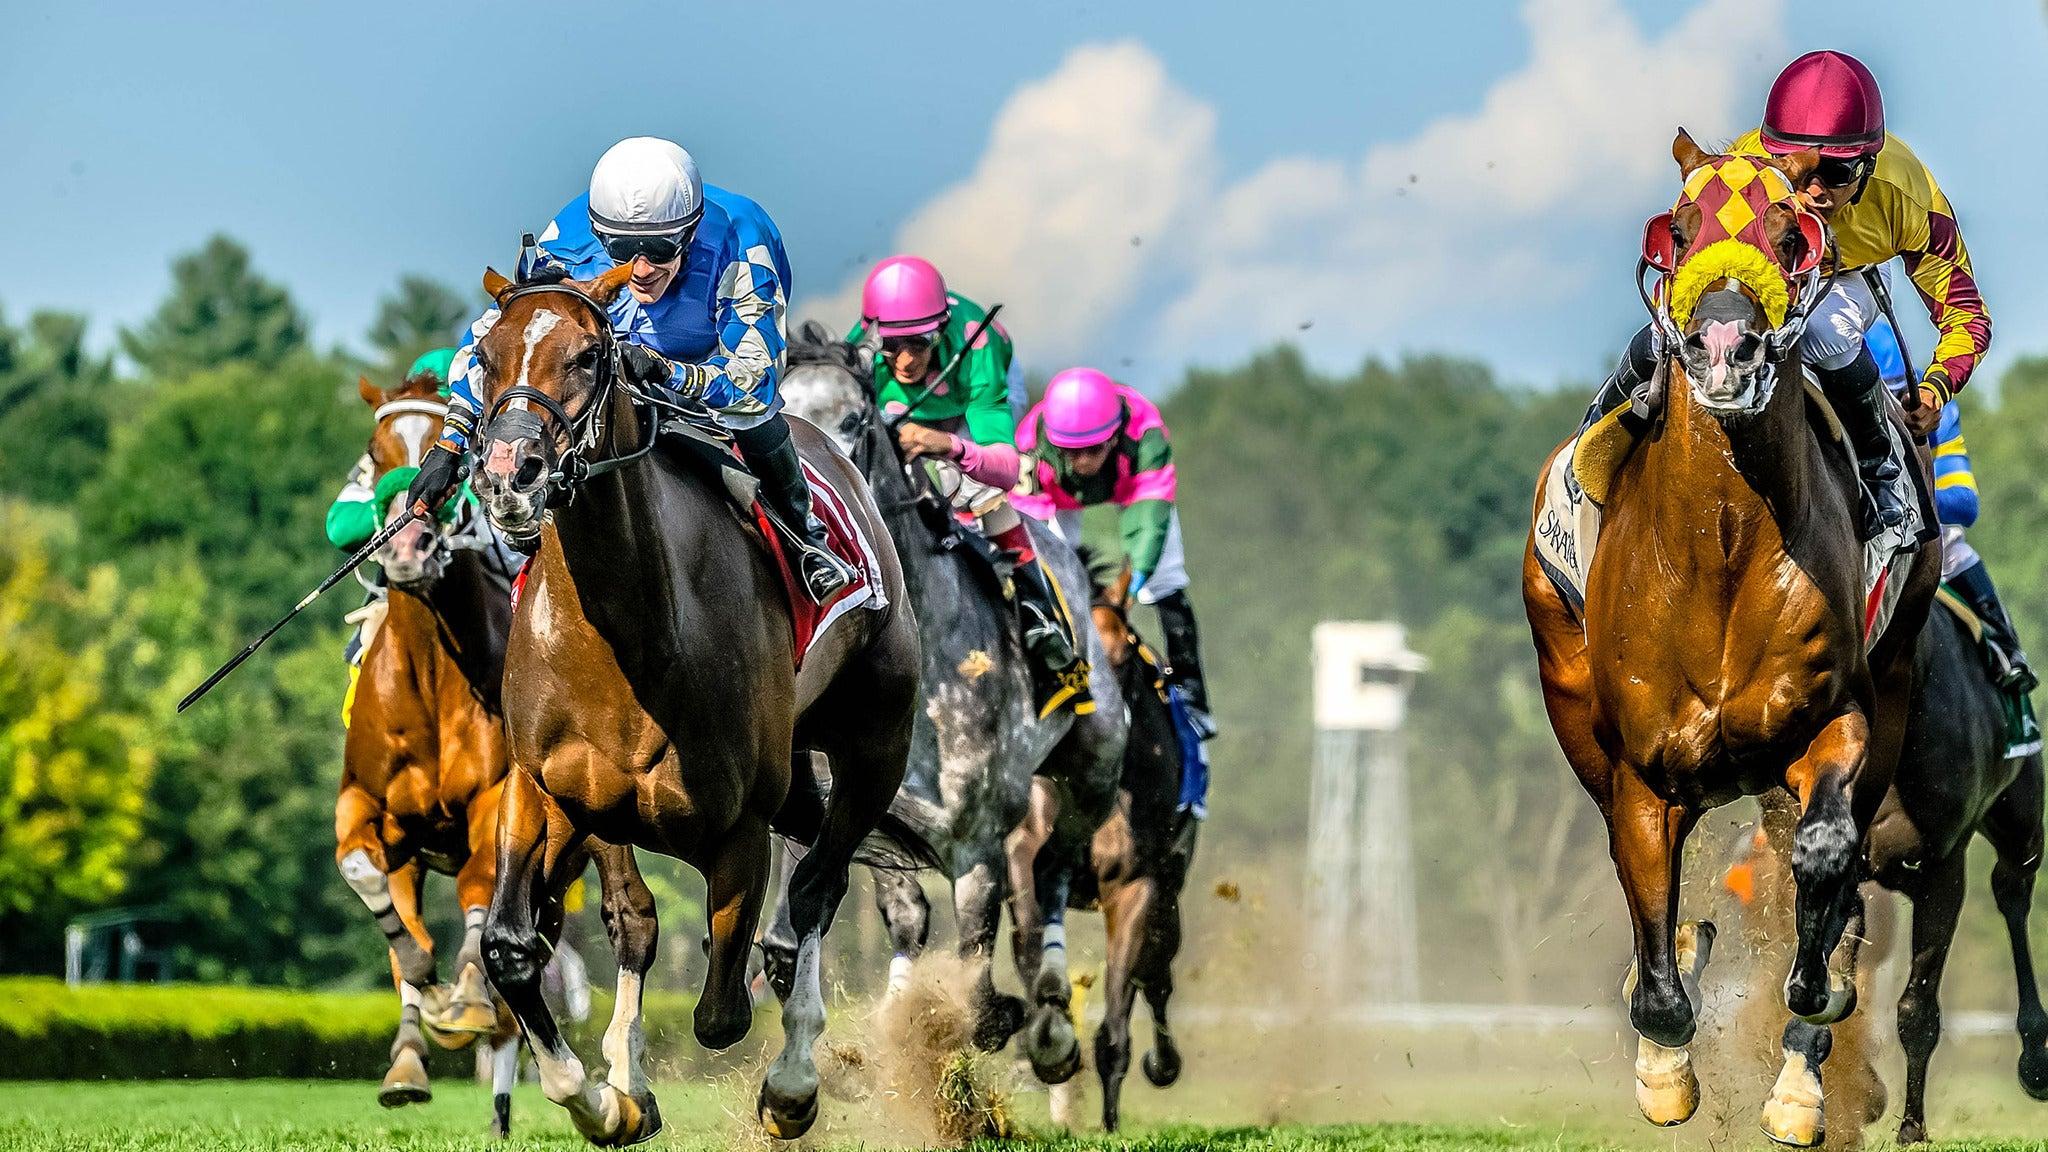 Saratoga Race Course Miller Lite Picnic Paddock